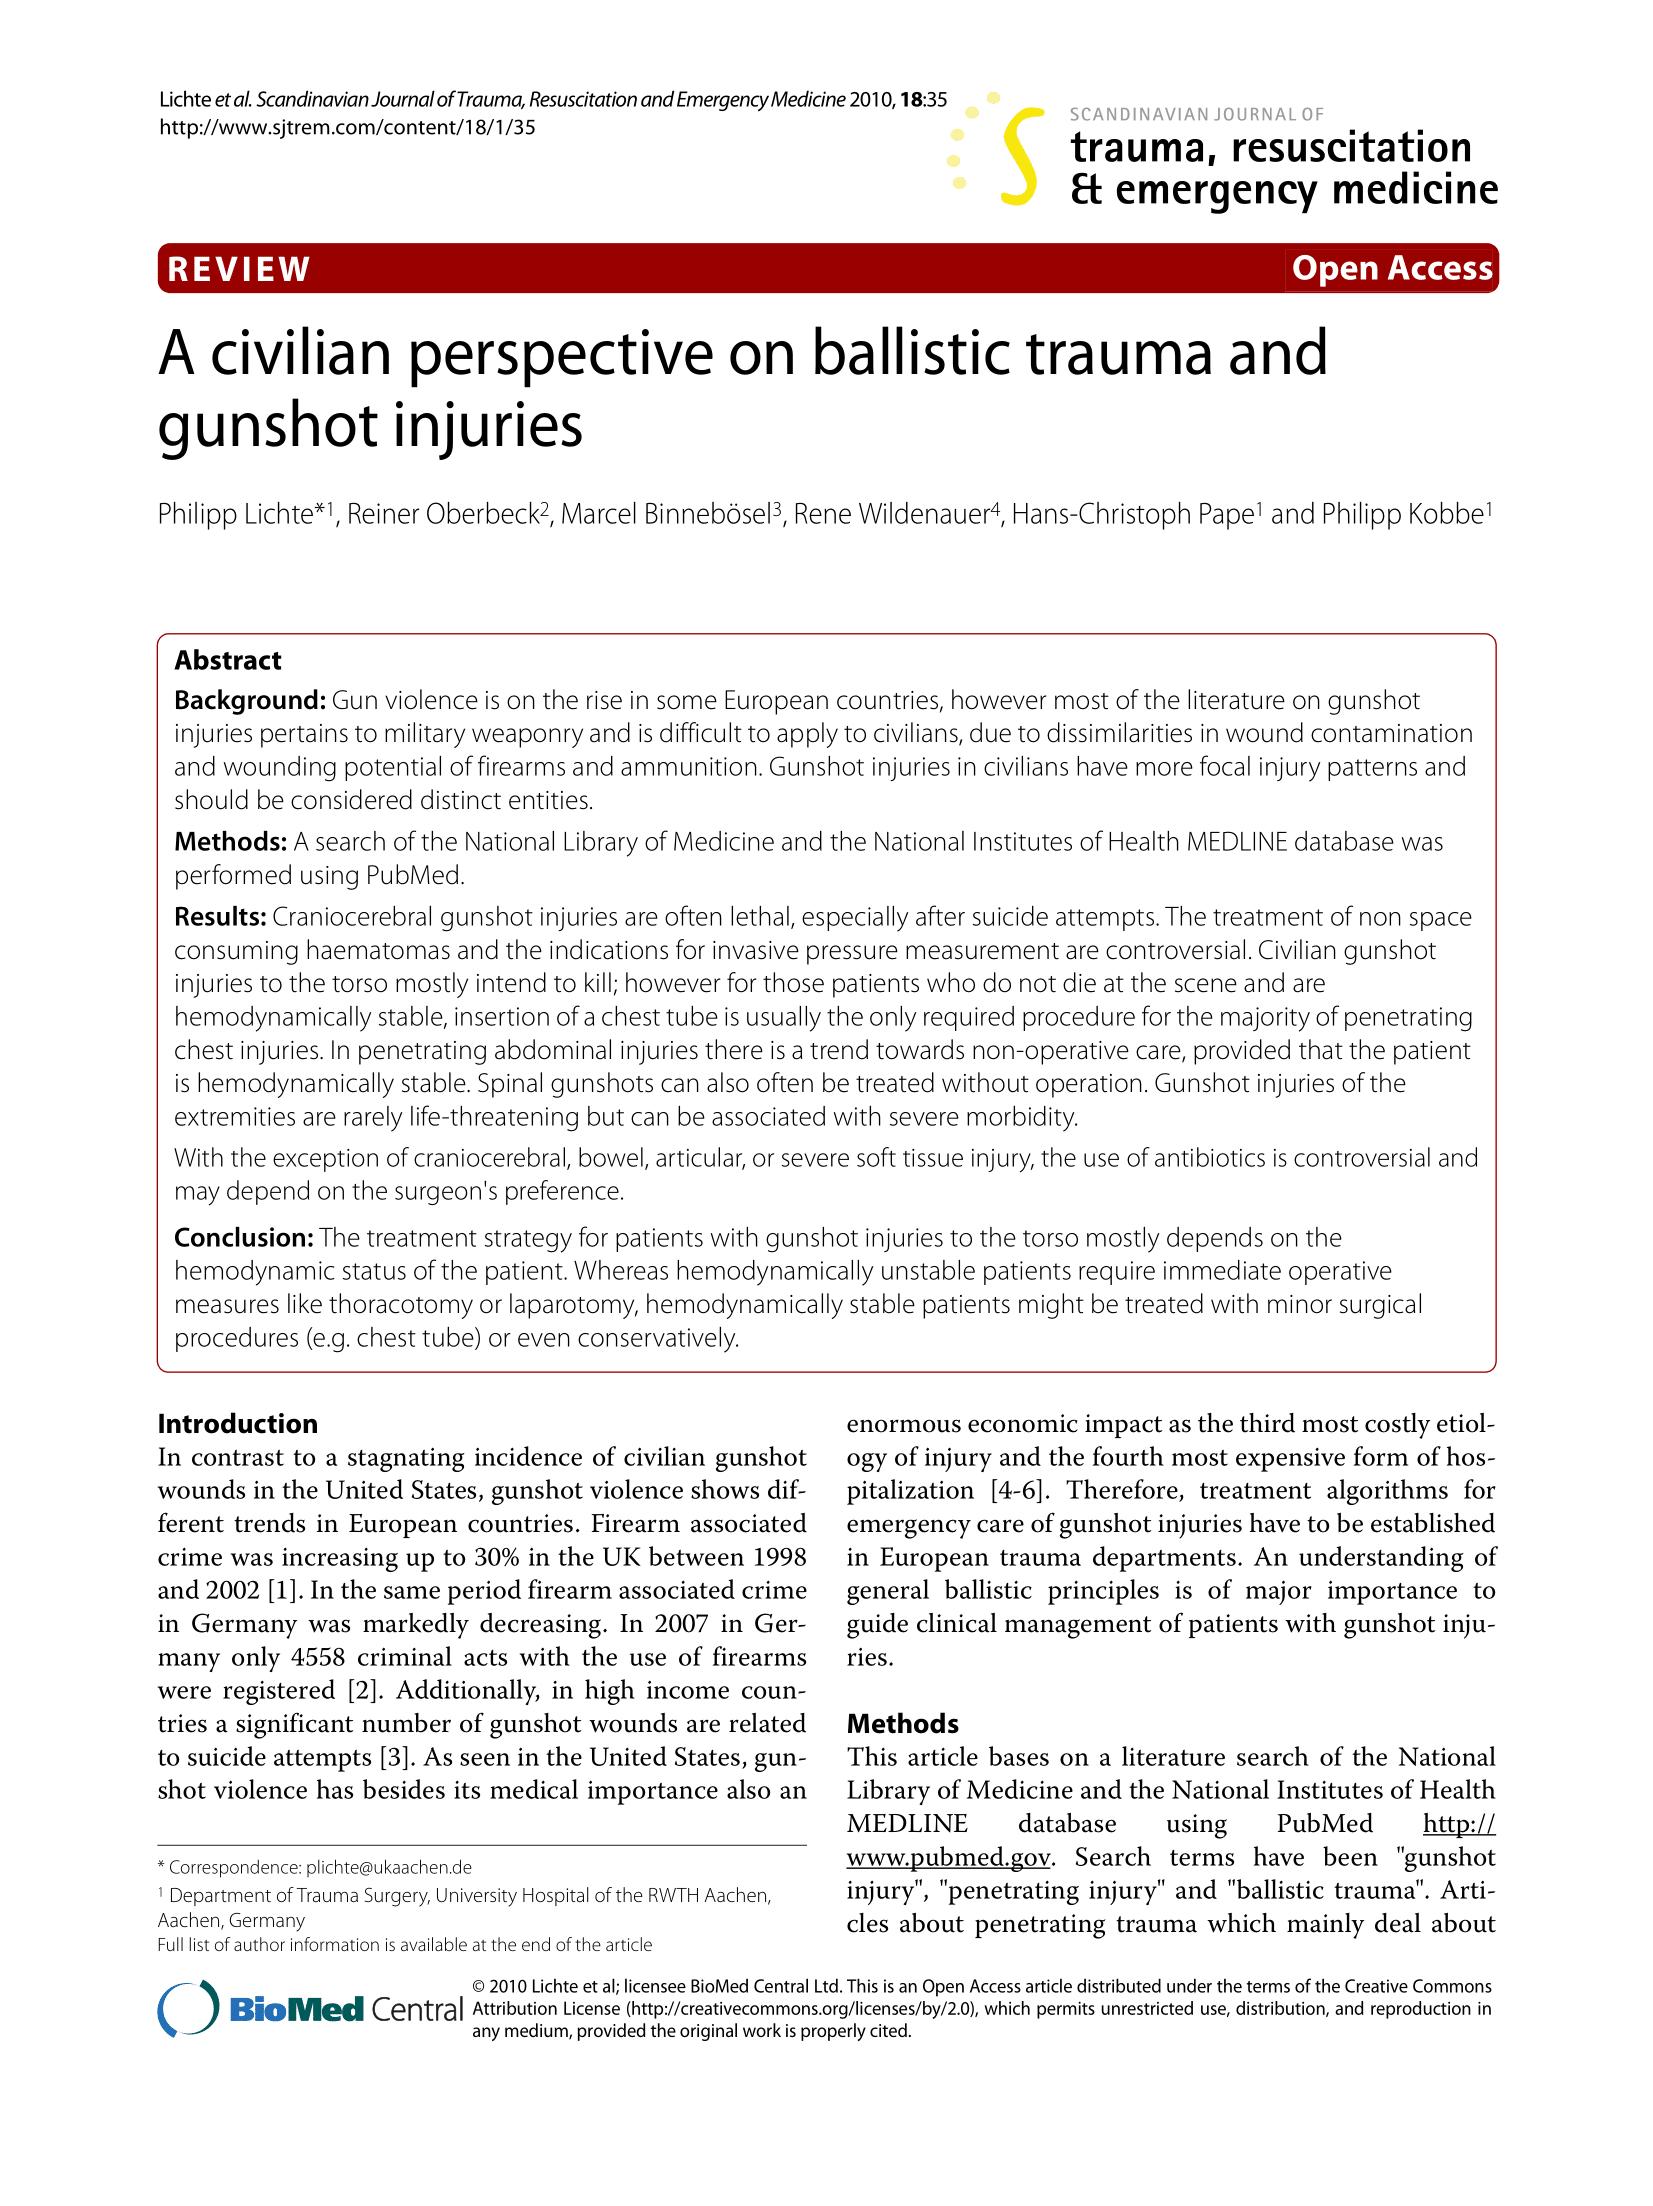 A Civilian Perspective on Ballistic Trauma and Gunshot Injuries